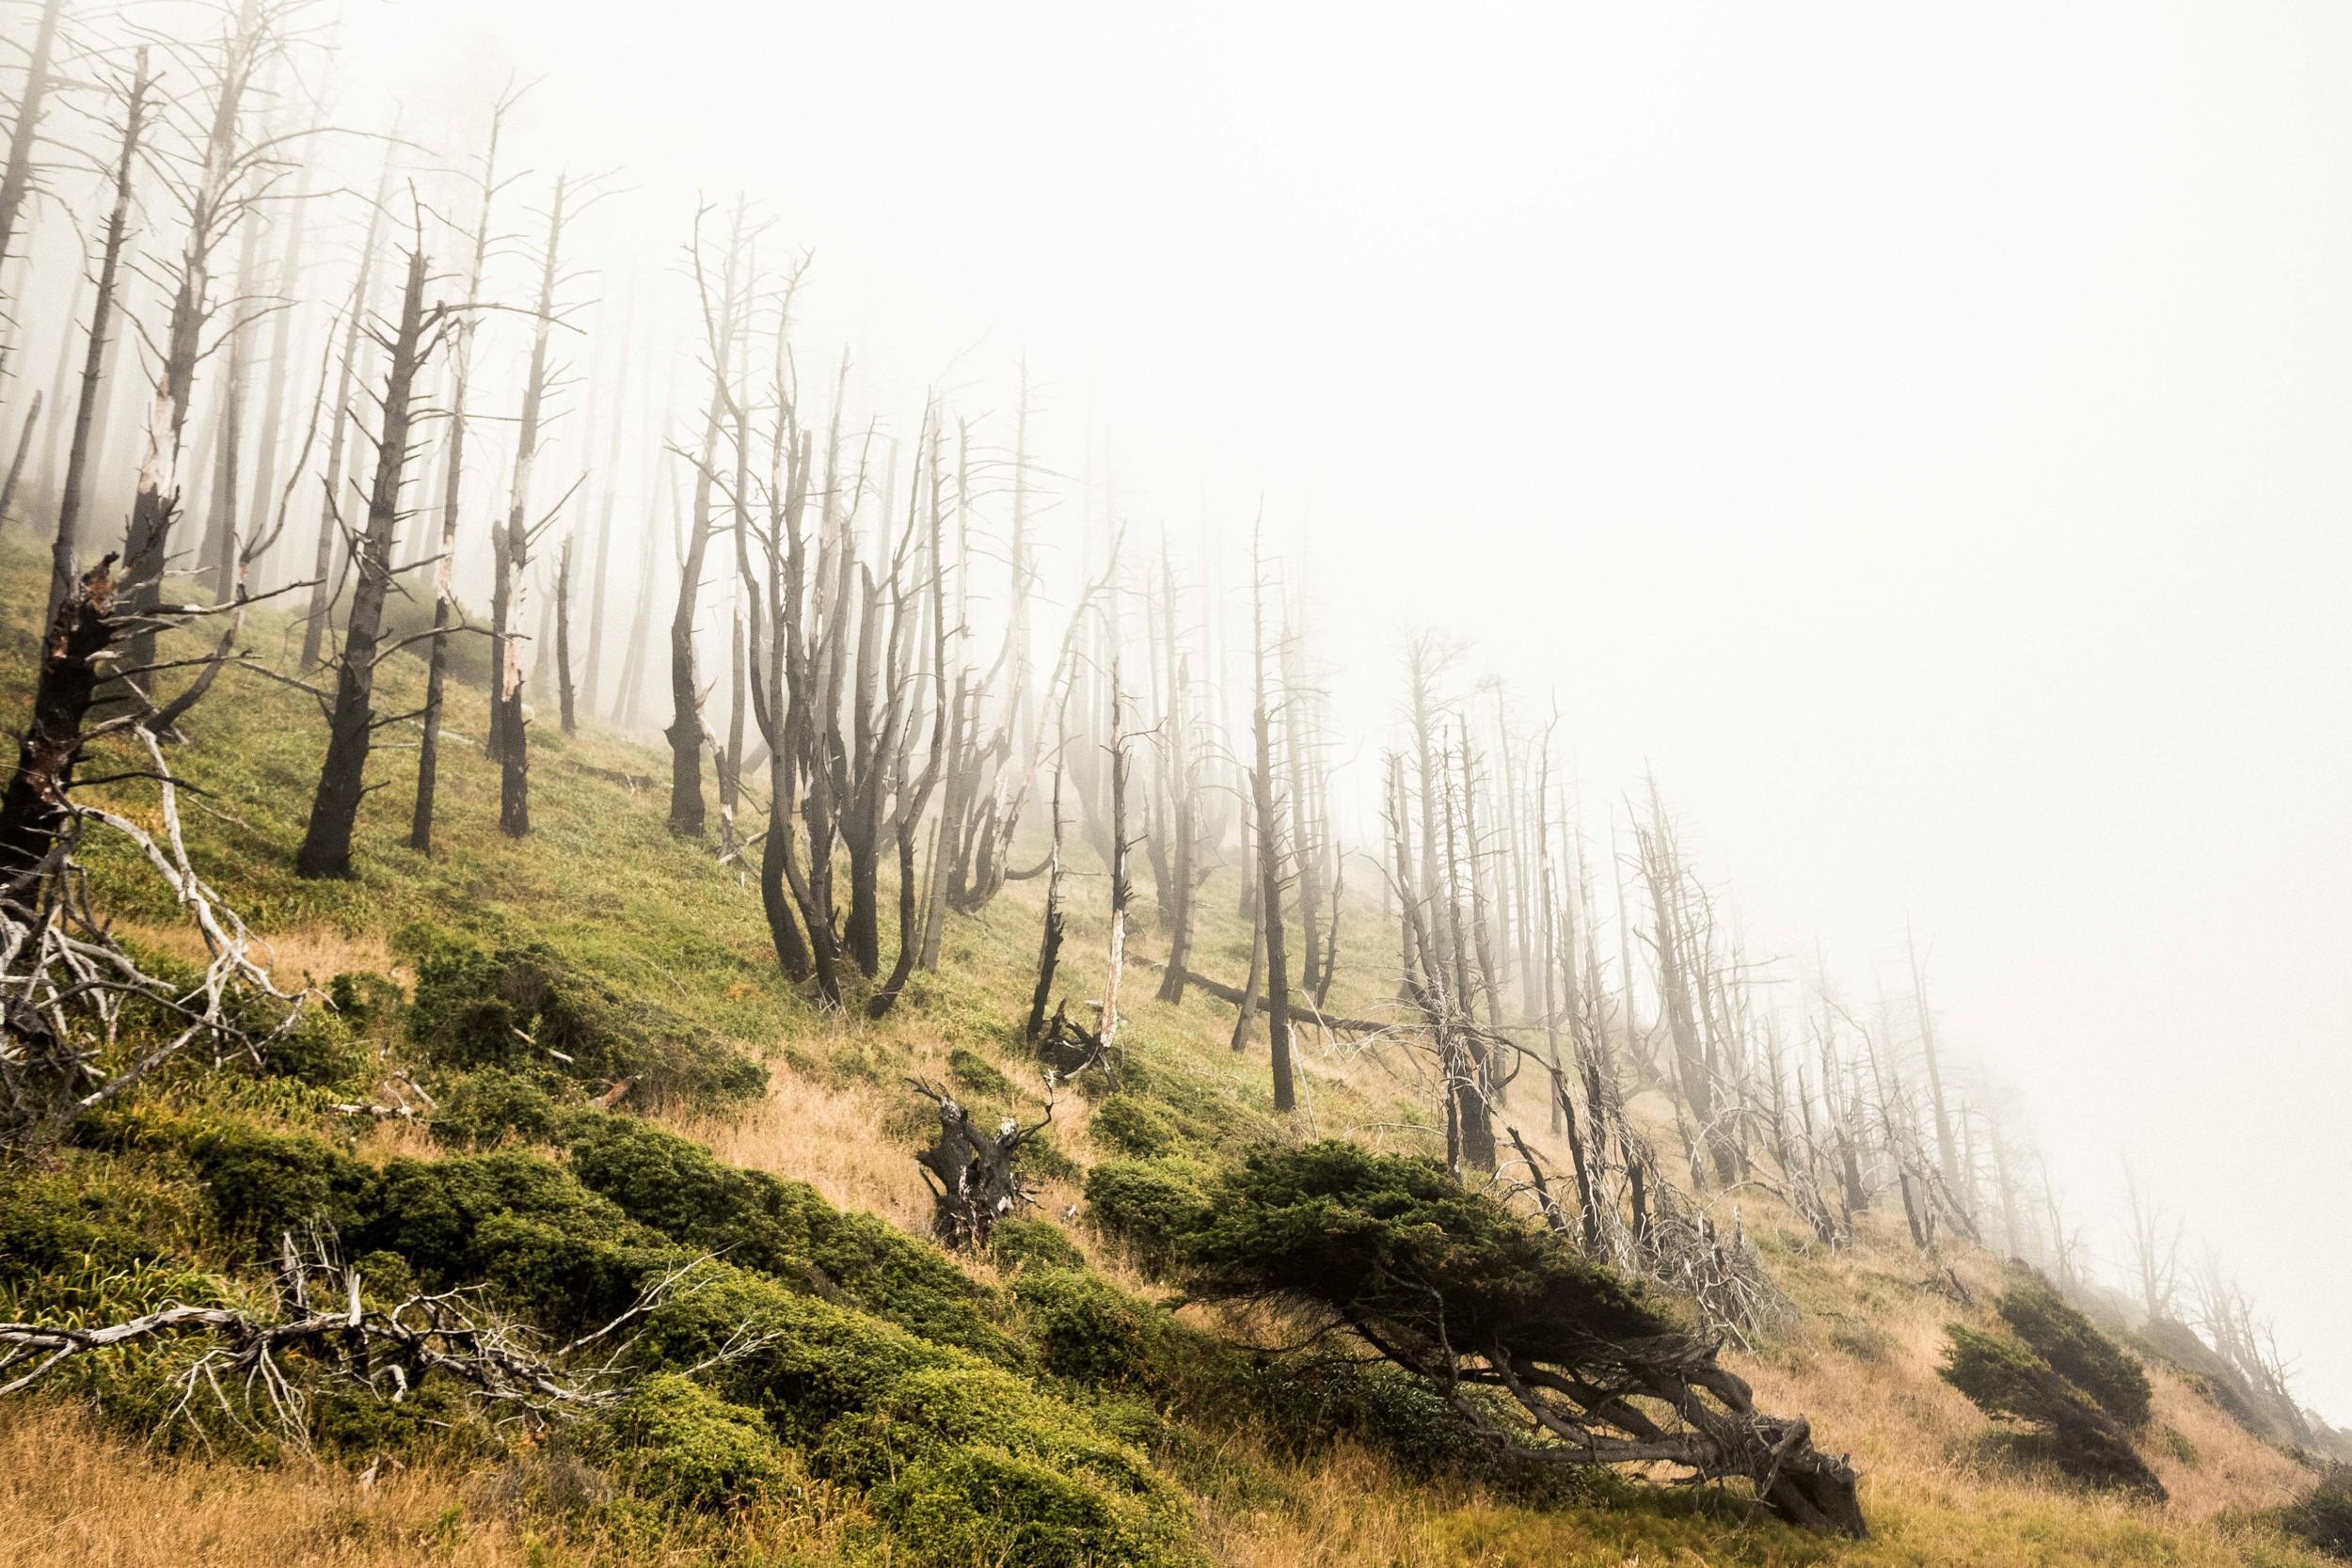 CA-LostCoast-FoggyDeadTrees.jpg